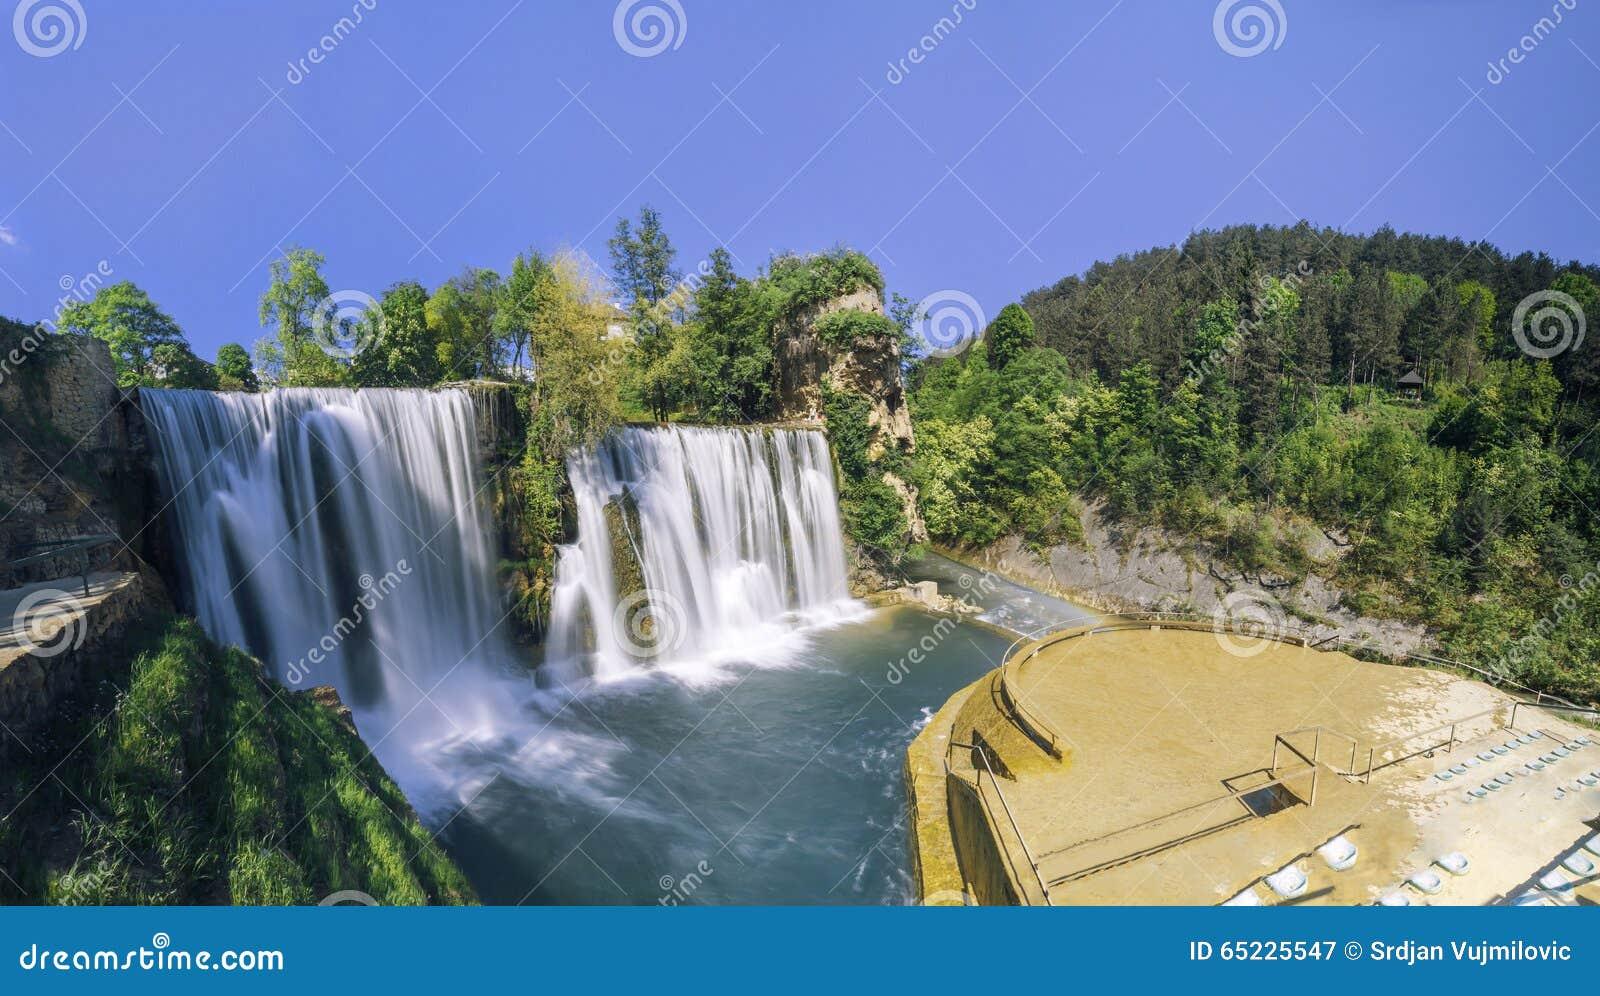 Waterfalls in city Jajce, Bosnia and Herzegovina.